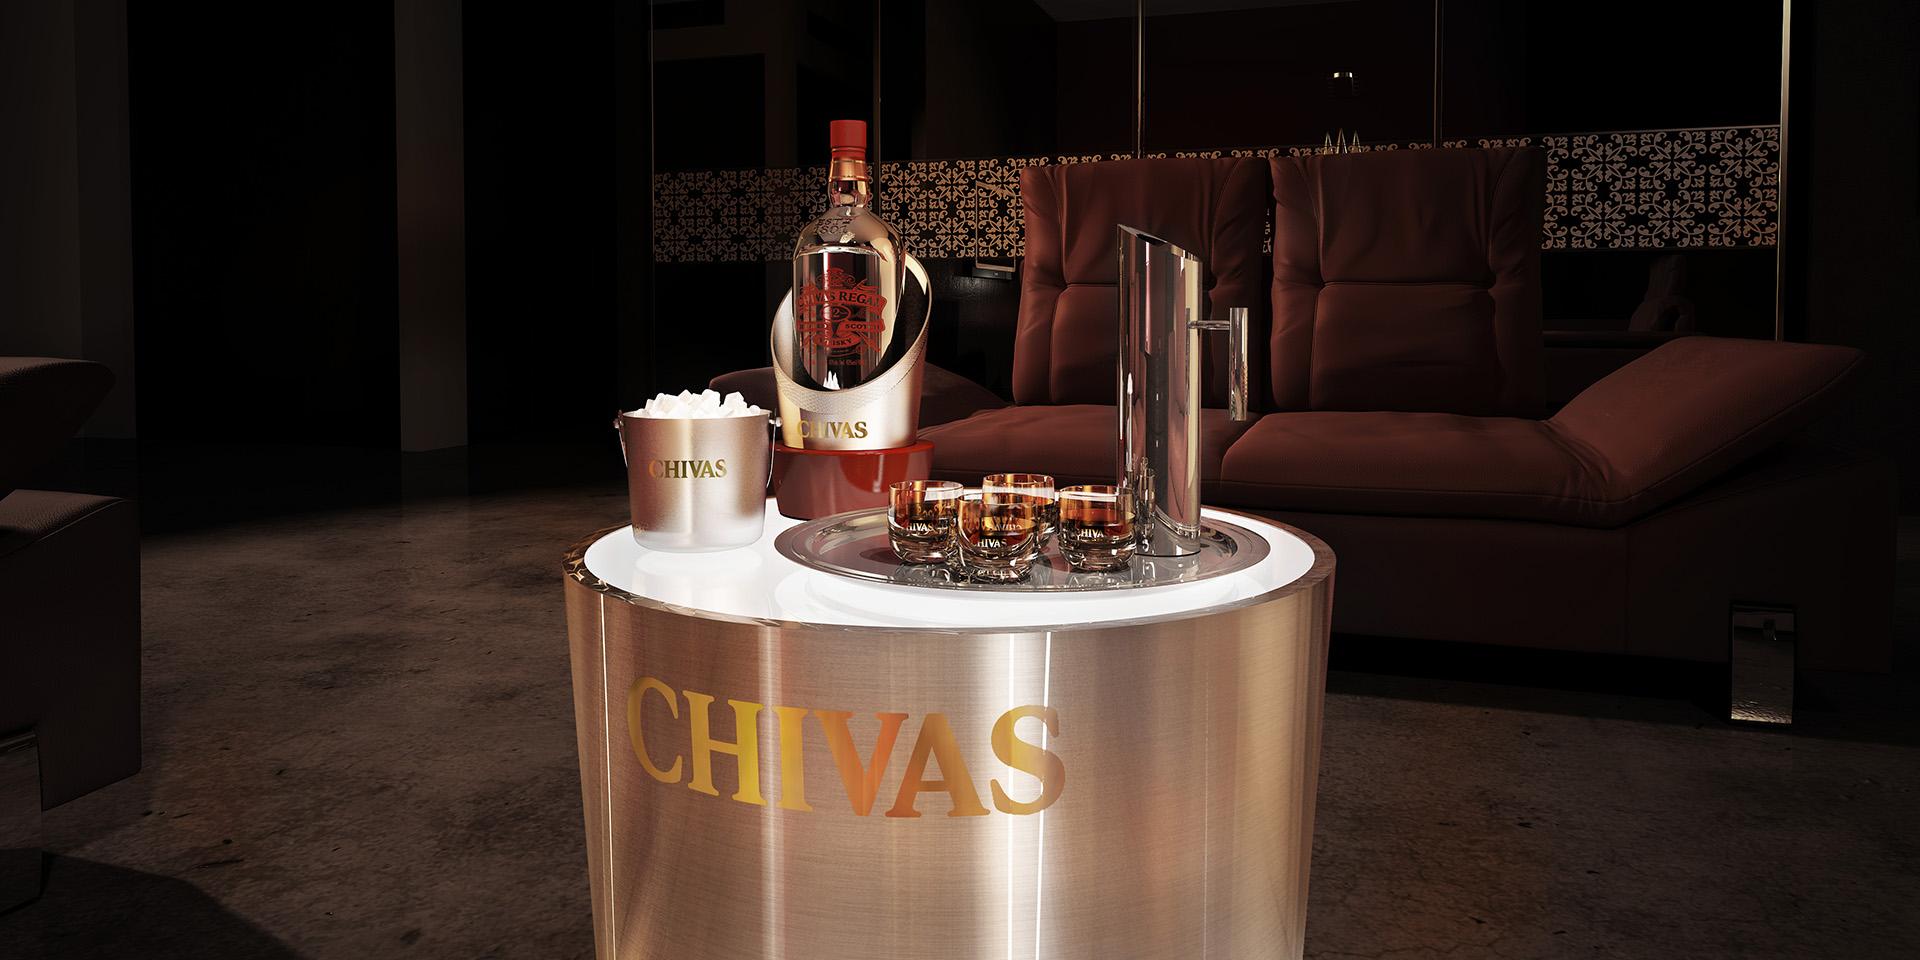 3D Chivas Regal Product Illustration